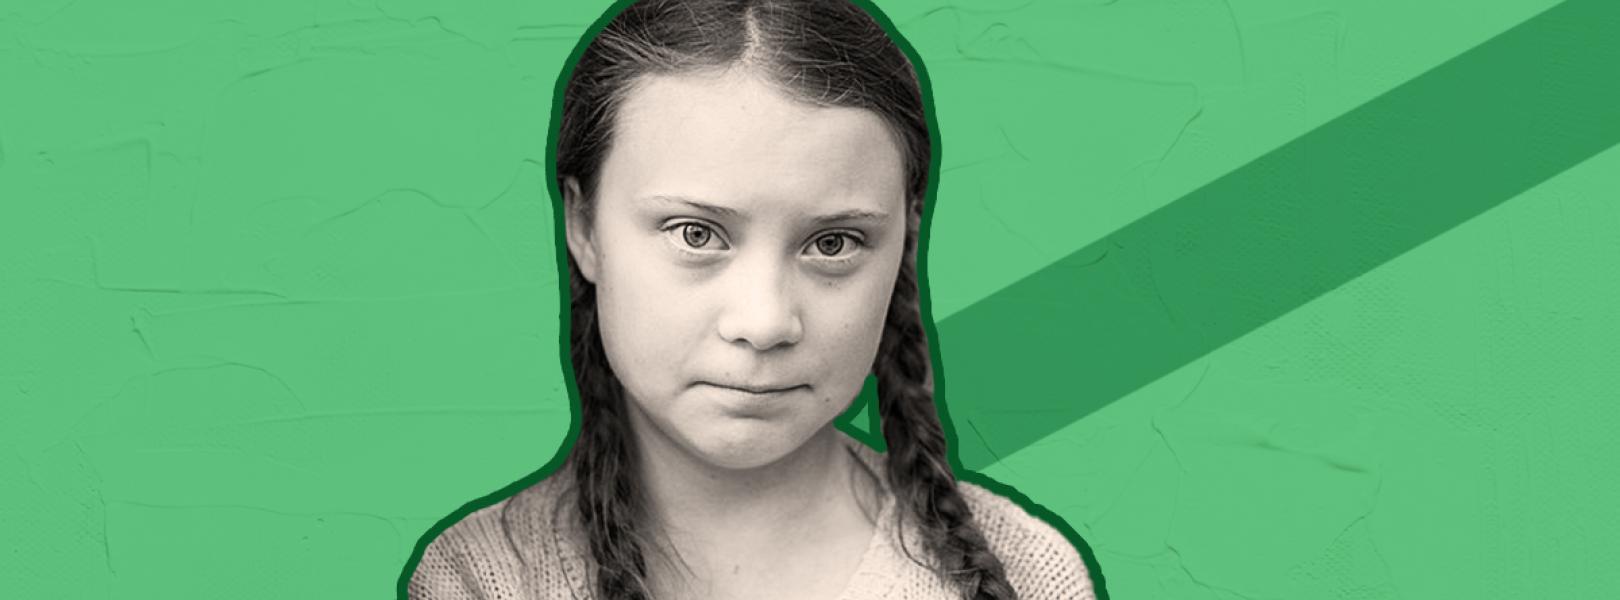 Right Wing Media Launch Unhinged Attacks On Greta Thunberg Media